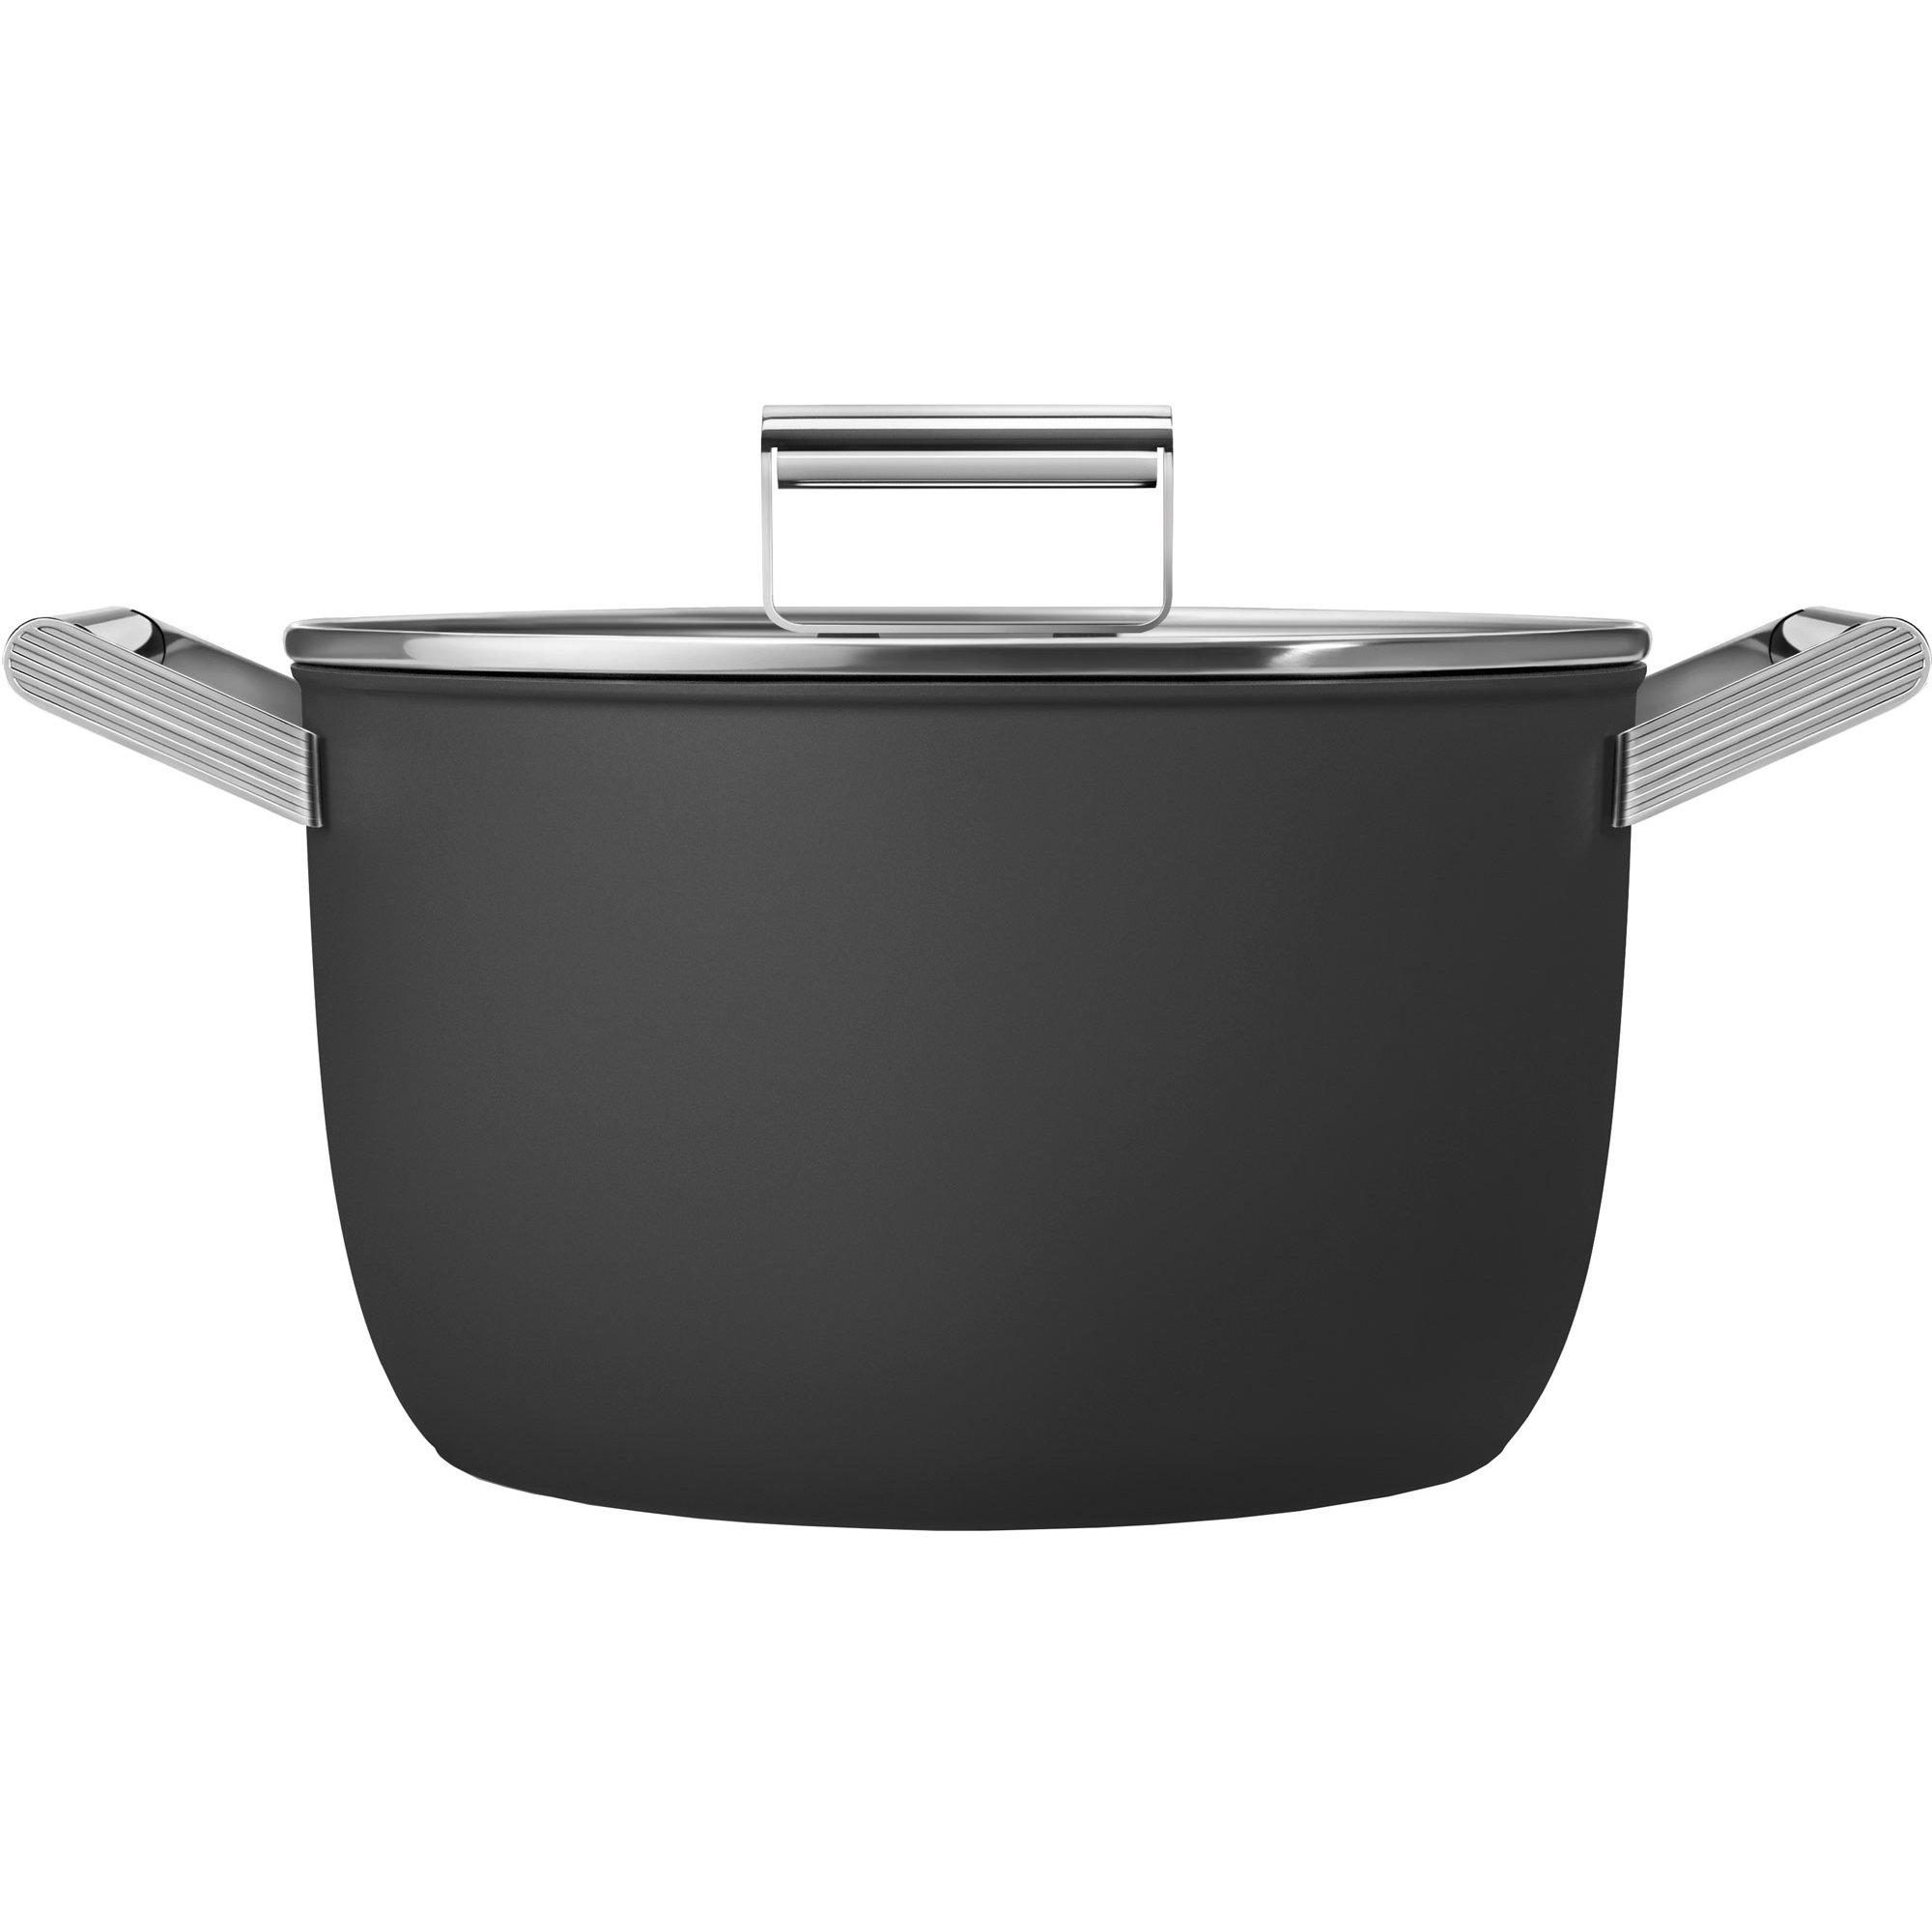 Smeg Kastrull m/lock 26 cm svart